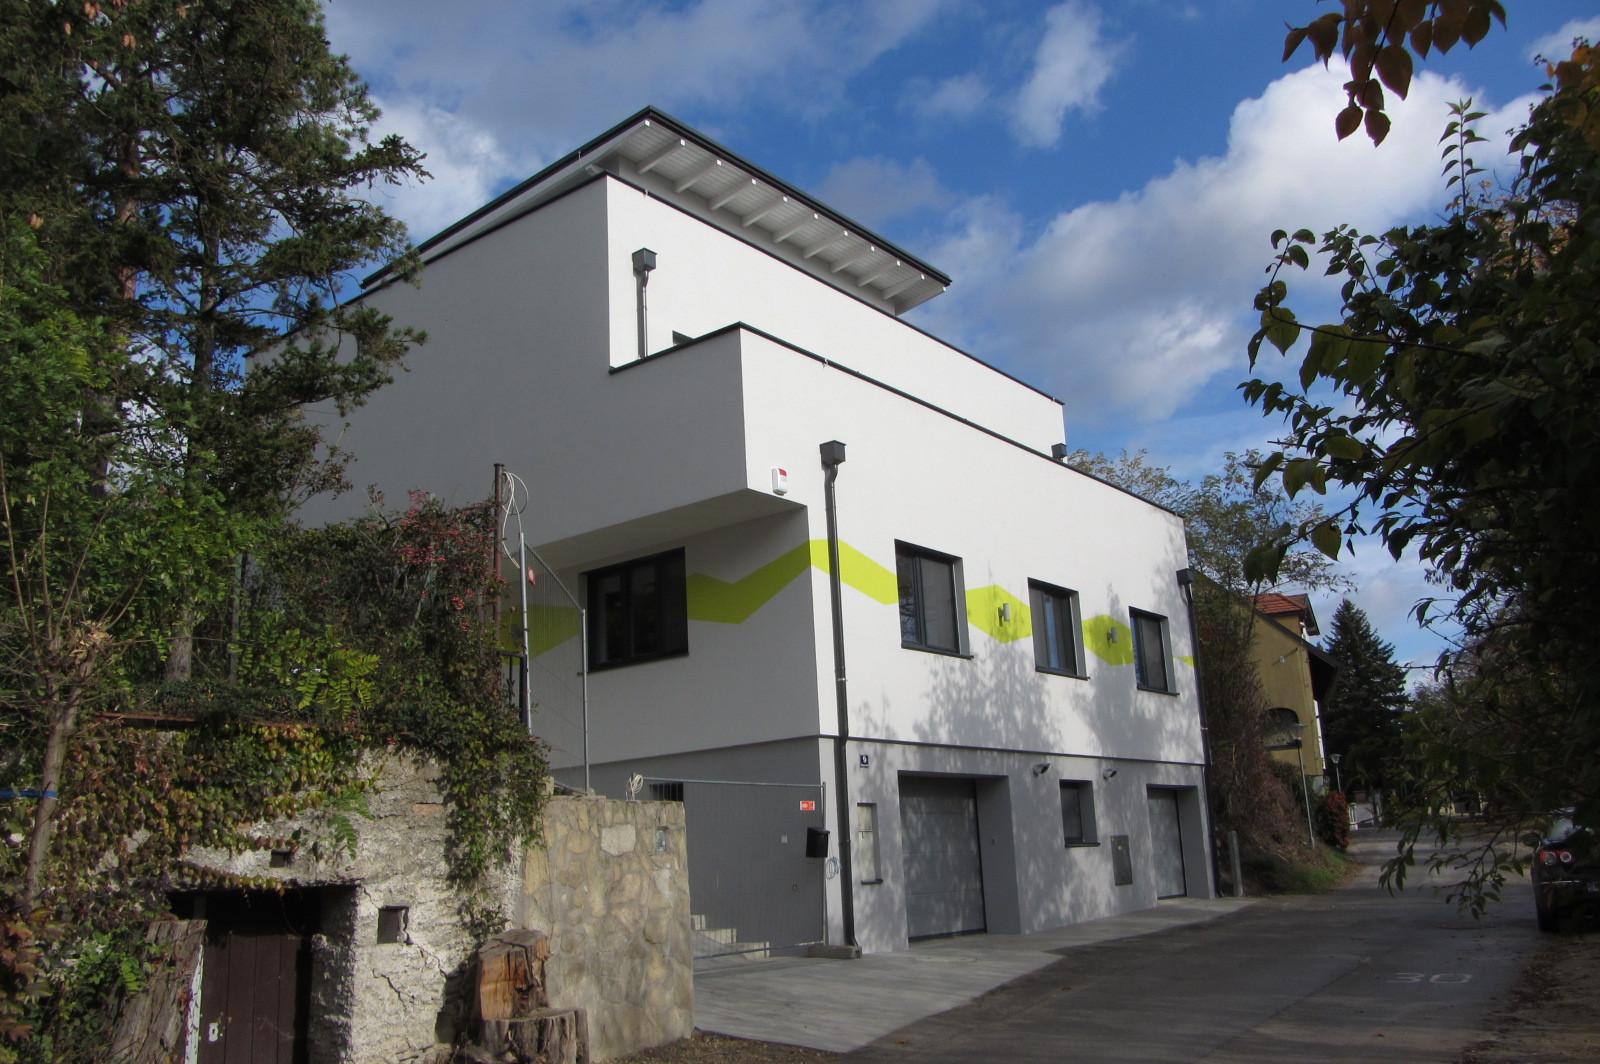 Niedrigenergiehaus Hagenbrunn 02.JPG